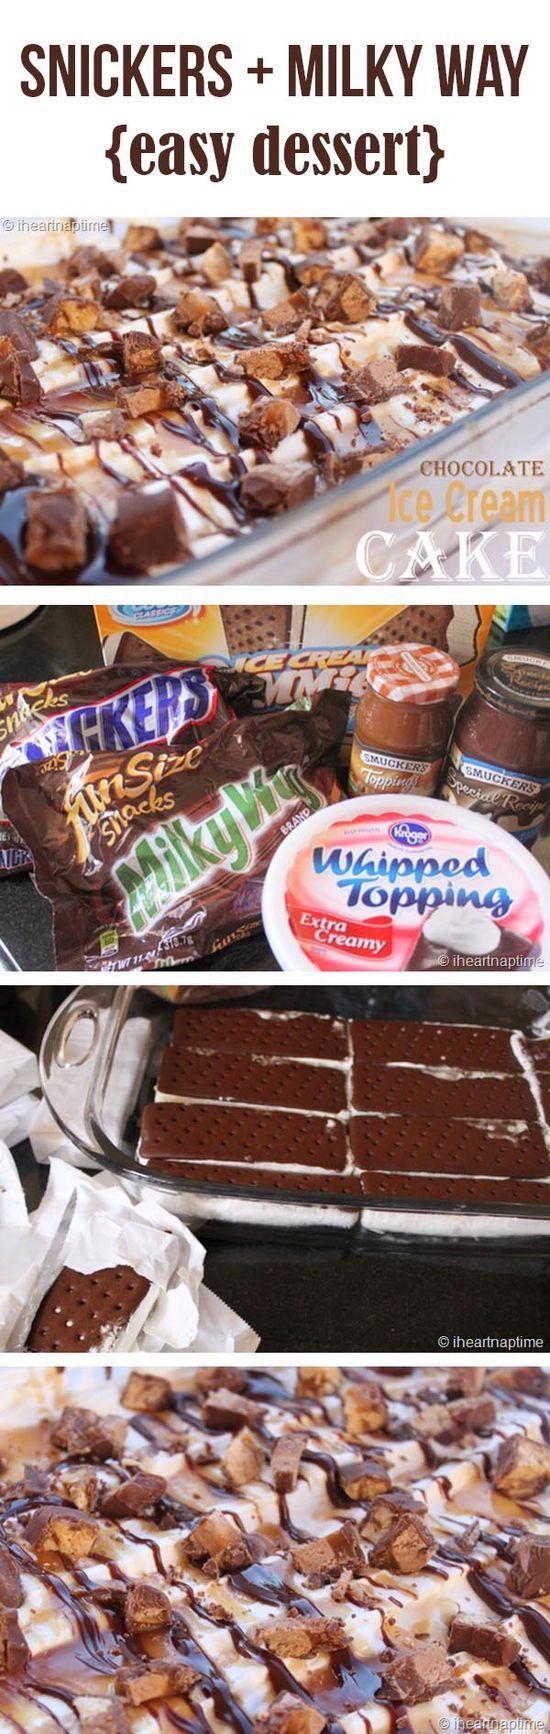 Easy and delicious chocolate caramel ice cream cake